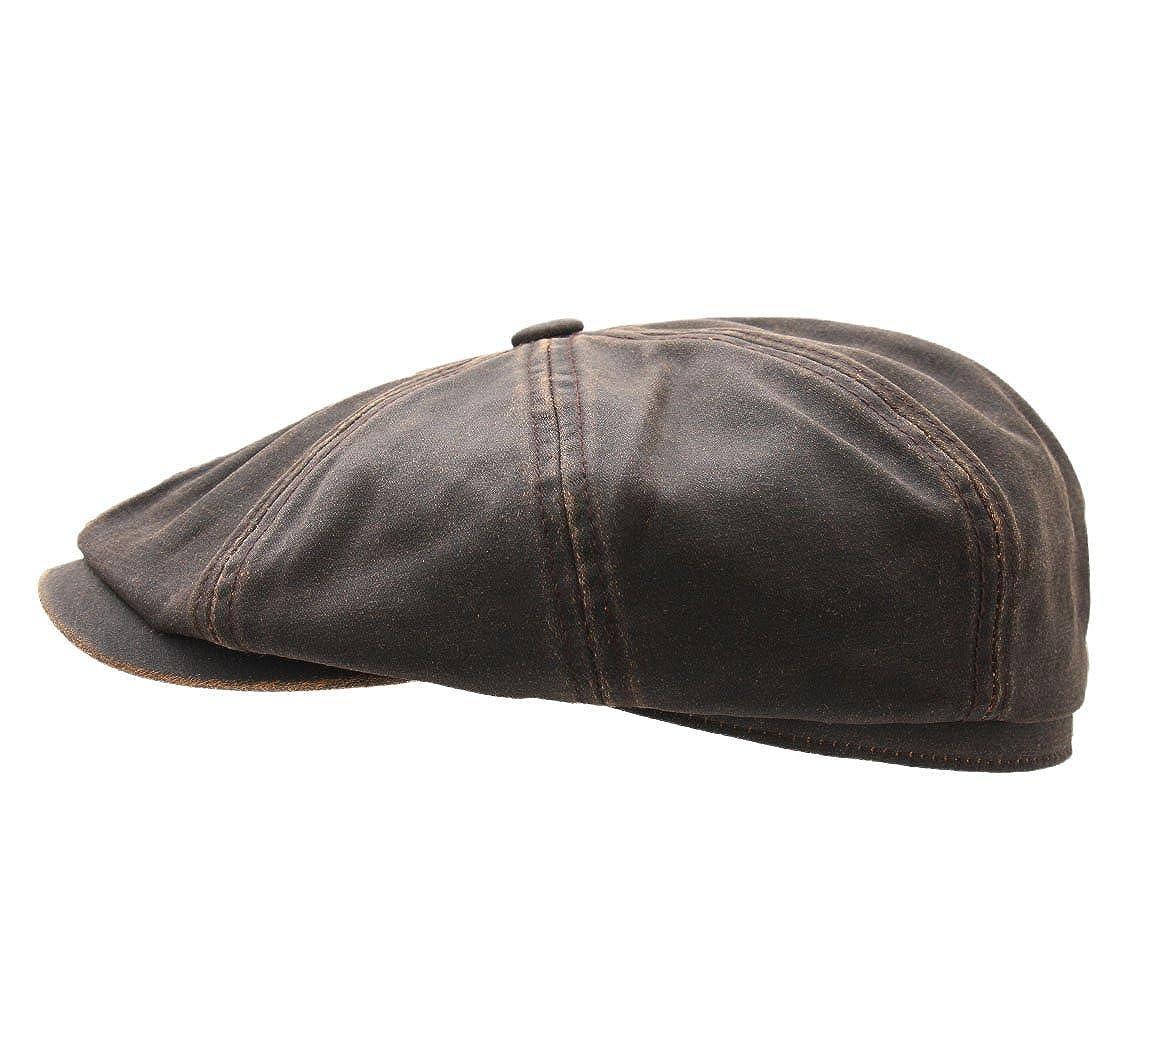 Stetson Mens Hatteras Co Flat Cap